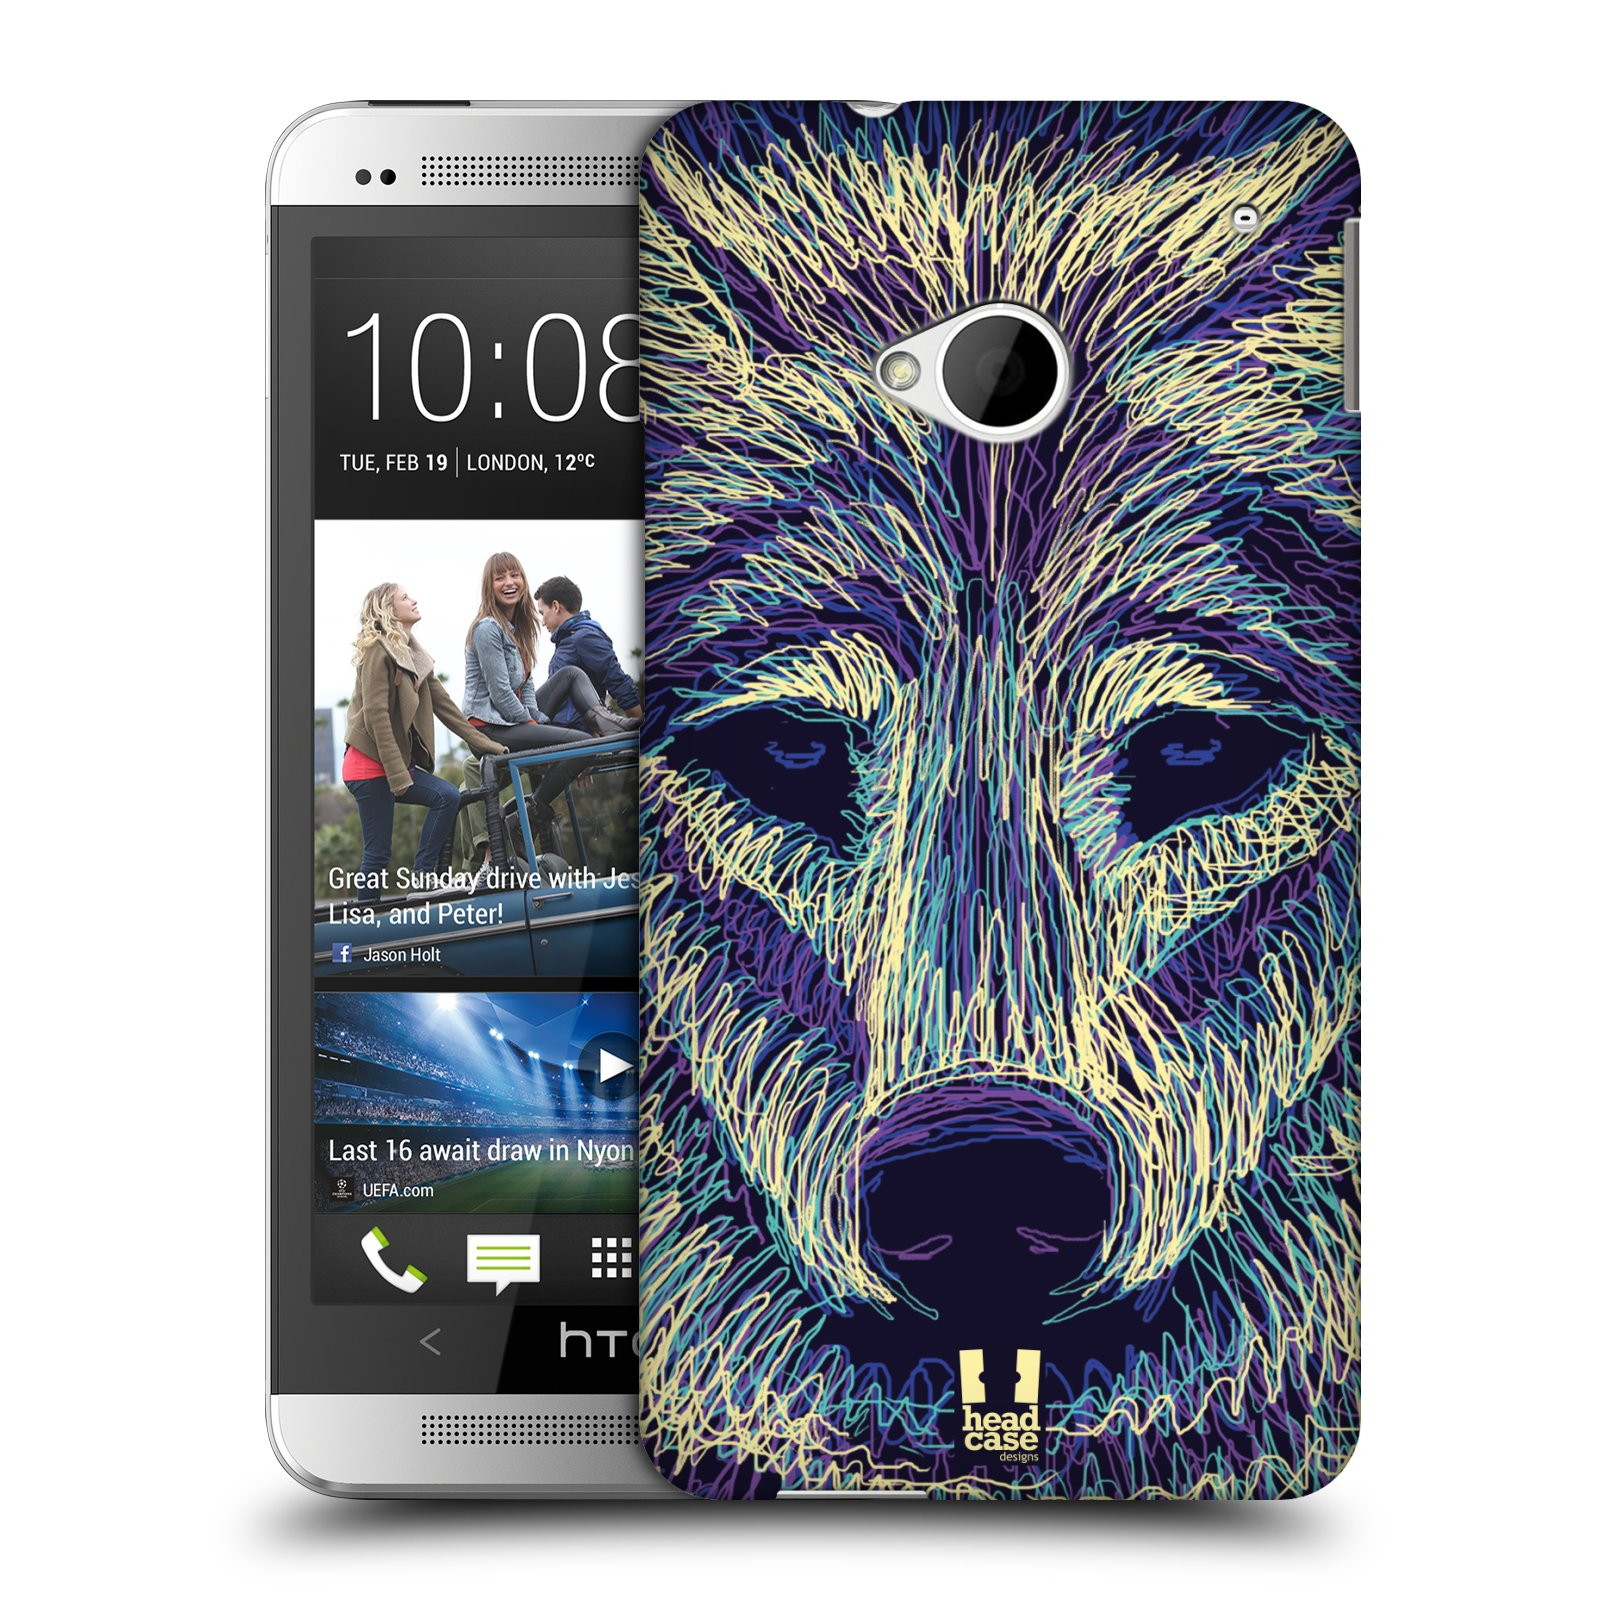 HEAD CASE plastový obal na mobil HTC One (M7) vzor zvíře čmáranice vlk